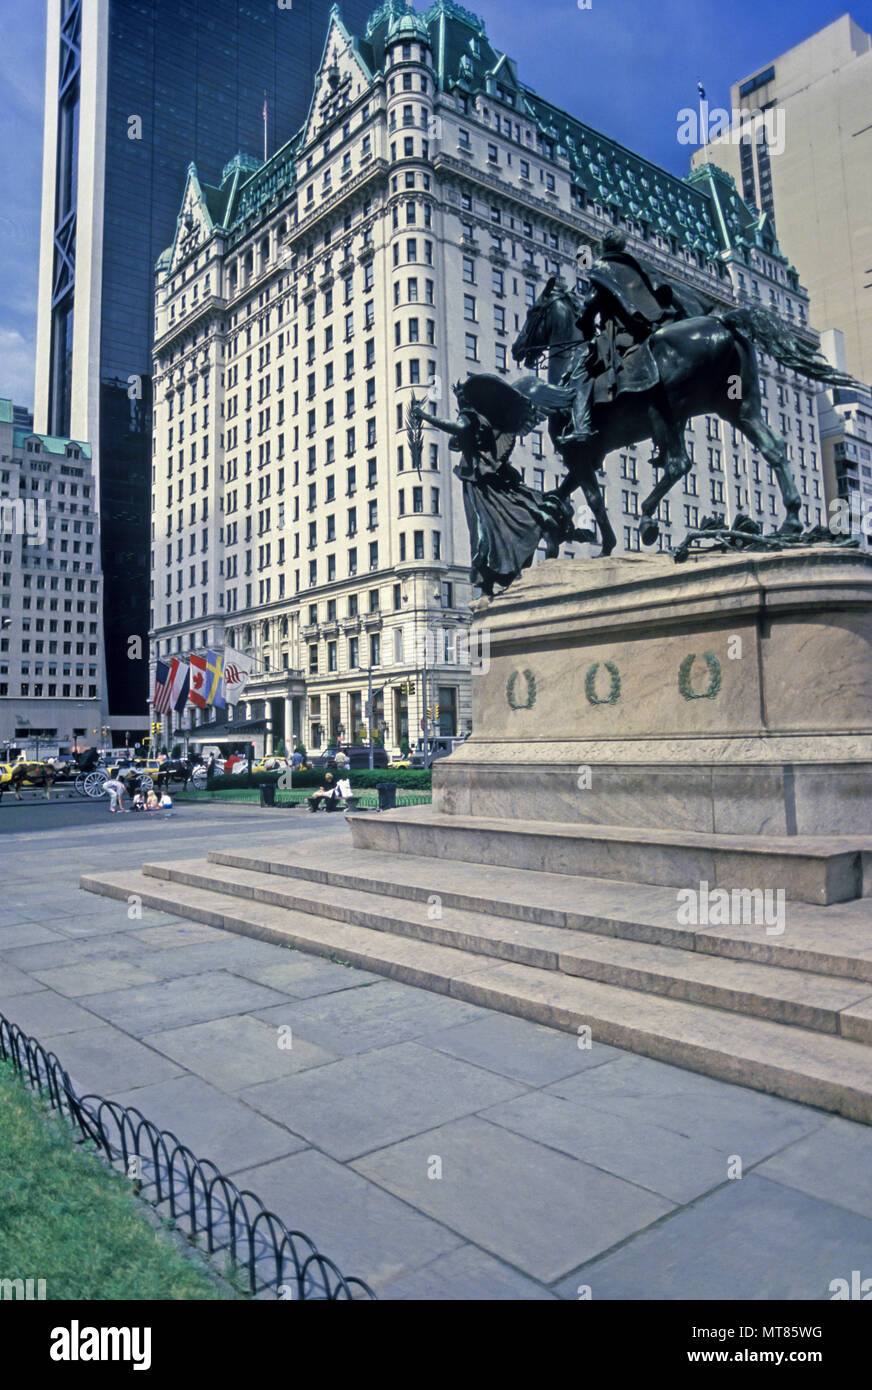 1988 HISTORICAL PLAZA HOTEL SHERMAN MONUMENT FIFTH AVENUE MIDTOWN MANHATTAN NEW YORK CITY USA - Stock Image